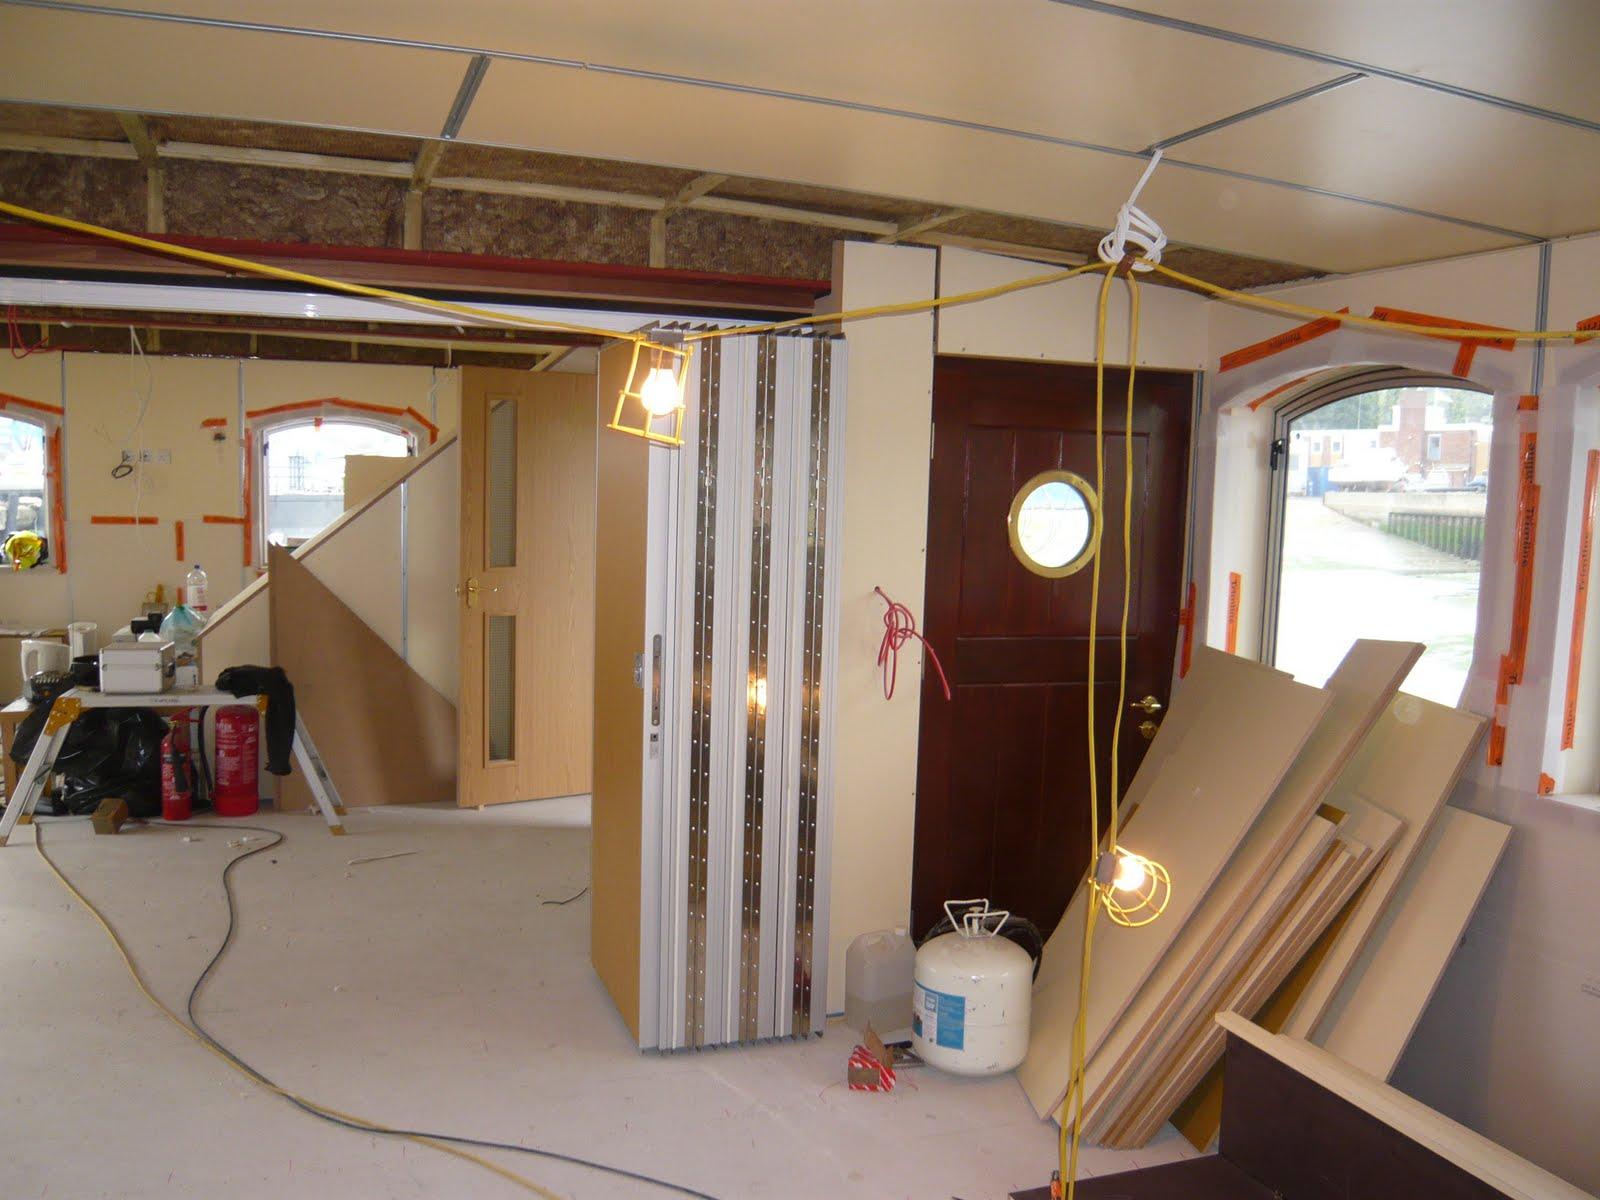 CYEs New Ship Blog Room divider galley floor galley shutter